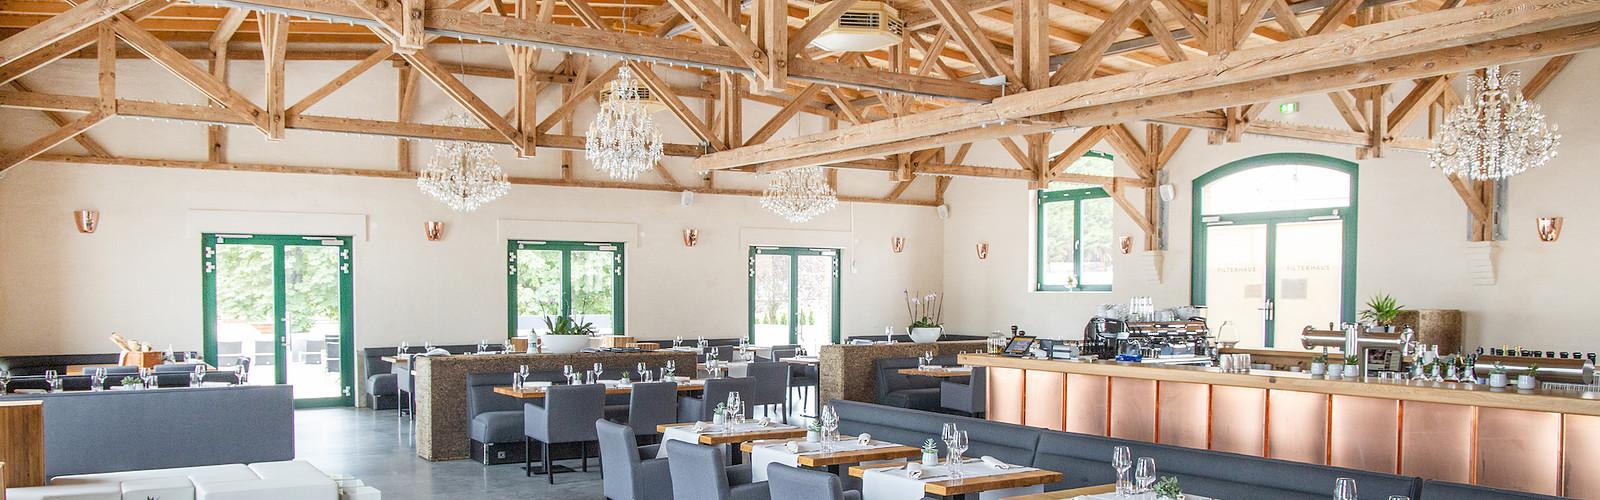 Restaurant Filterhaus, Foto: Karsten Wiesner